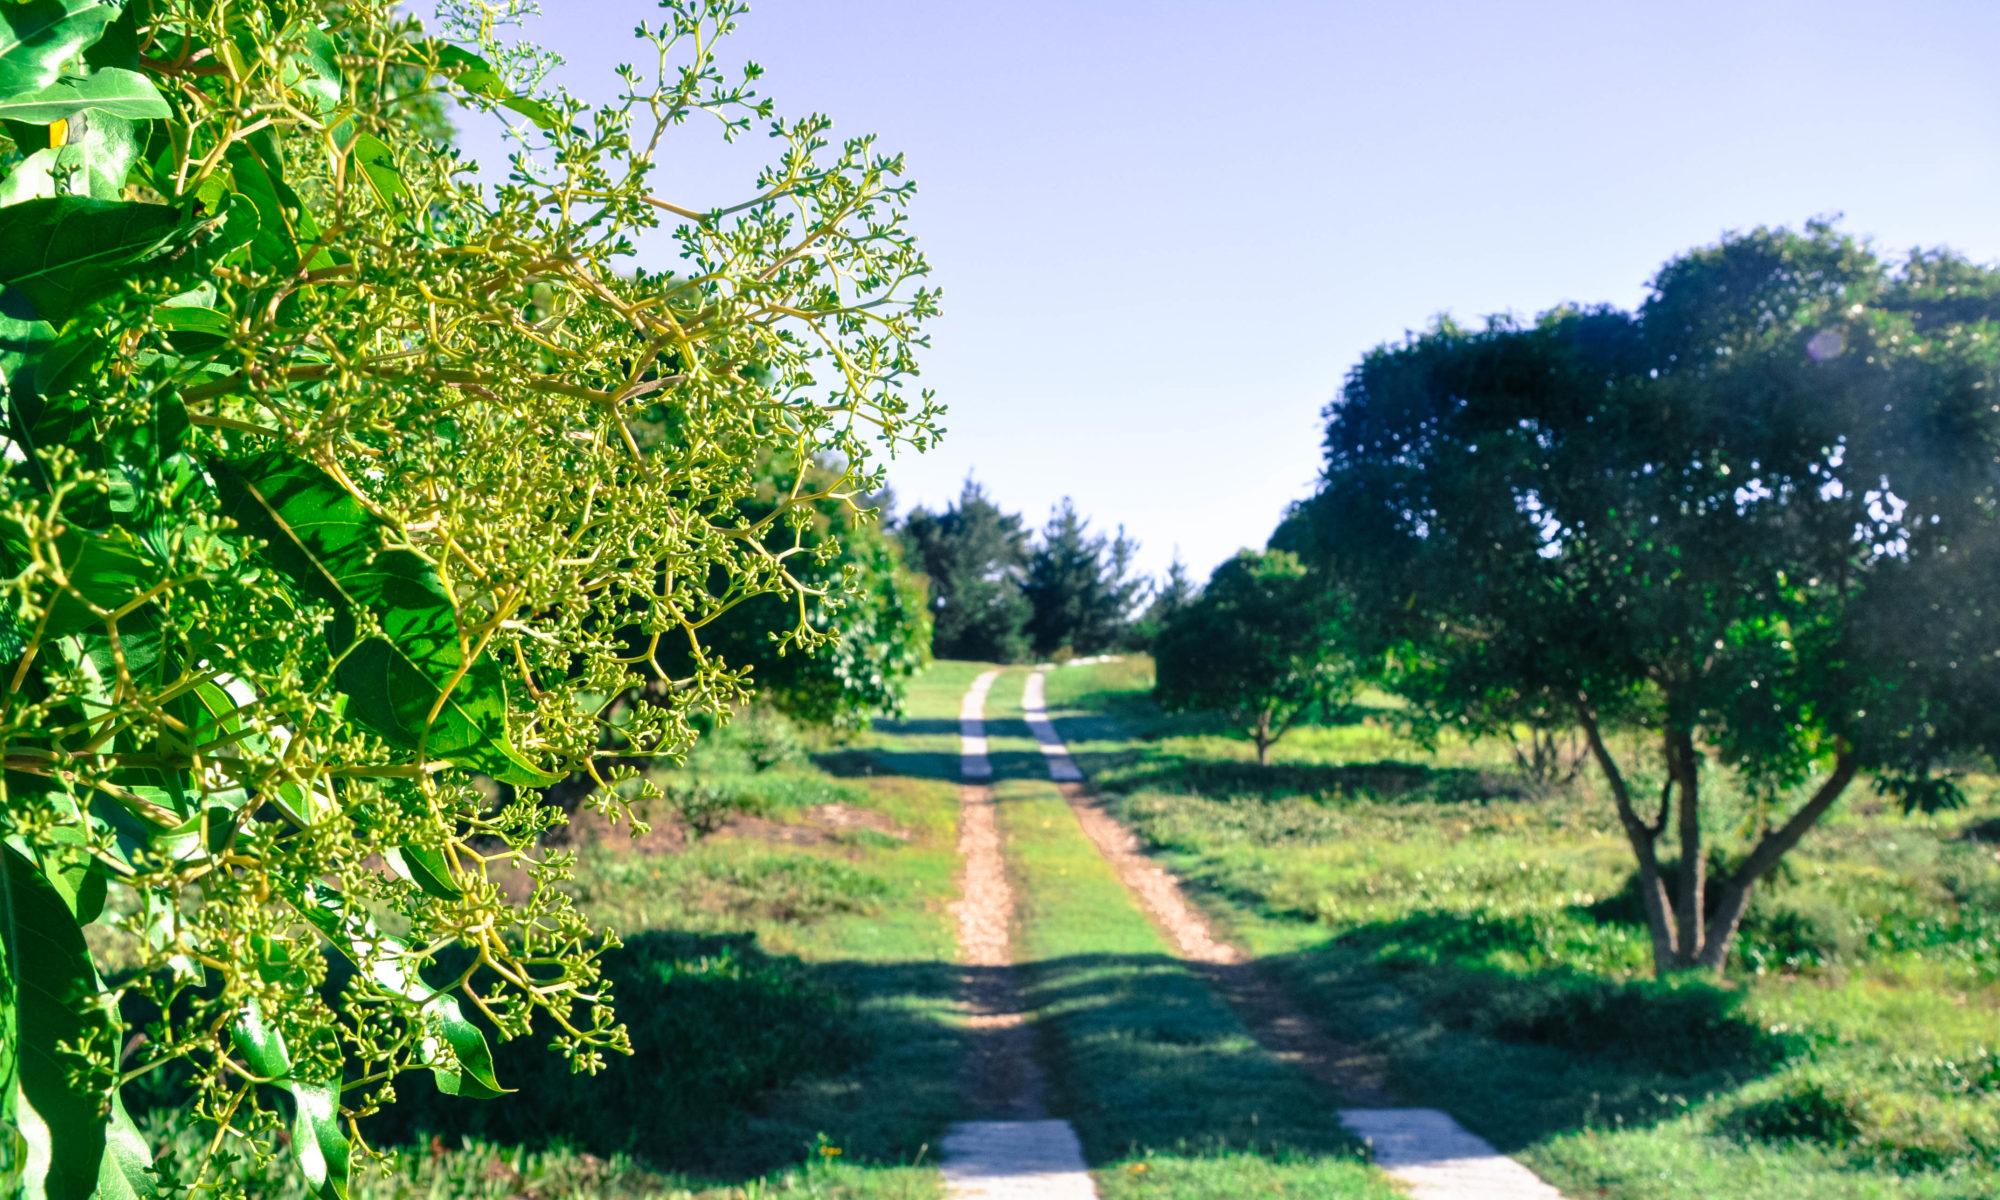 Equleni Farm